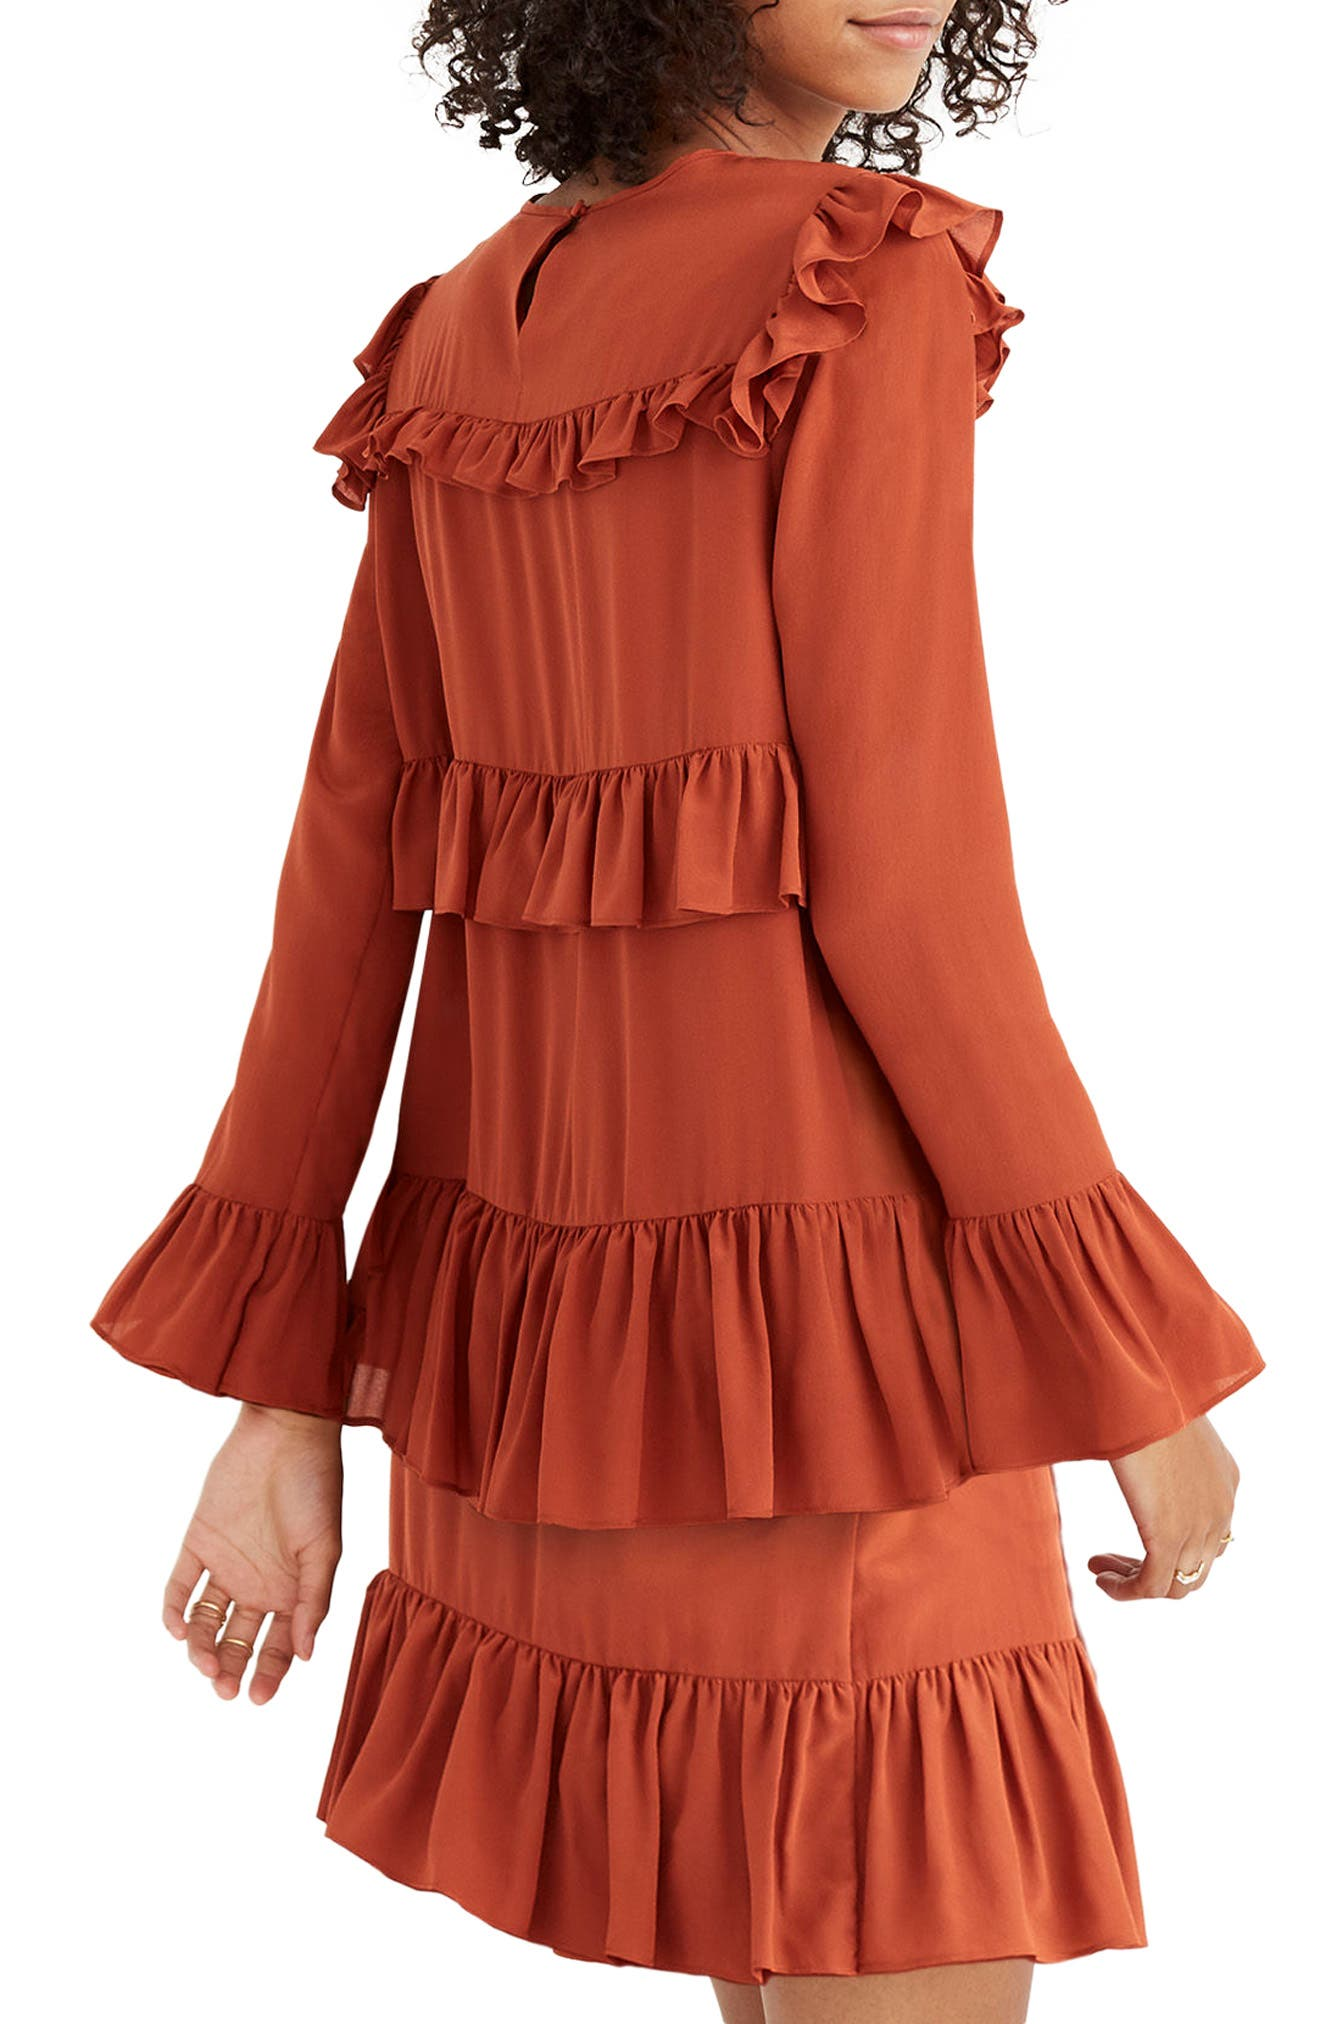 Waterlily Ruffle Dress,                             Alternate thumbnail 2, color,